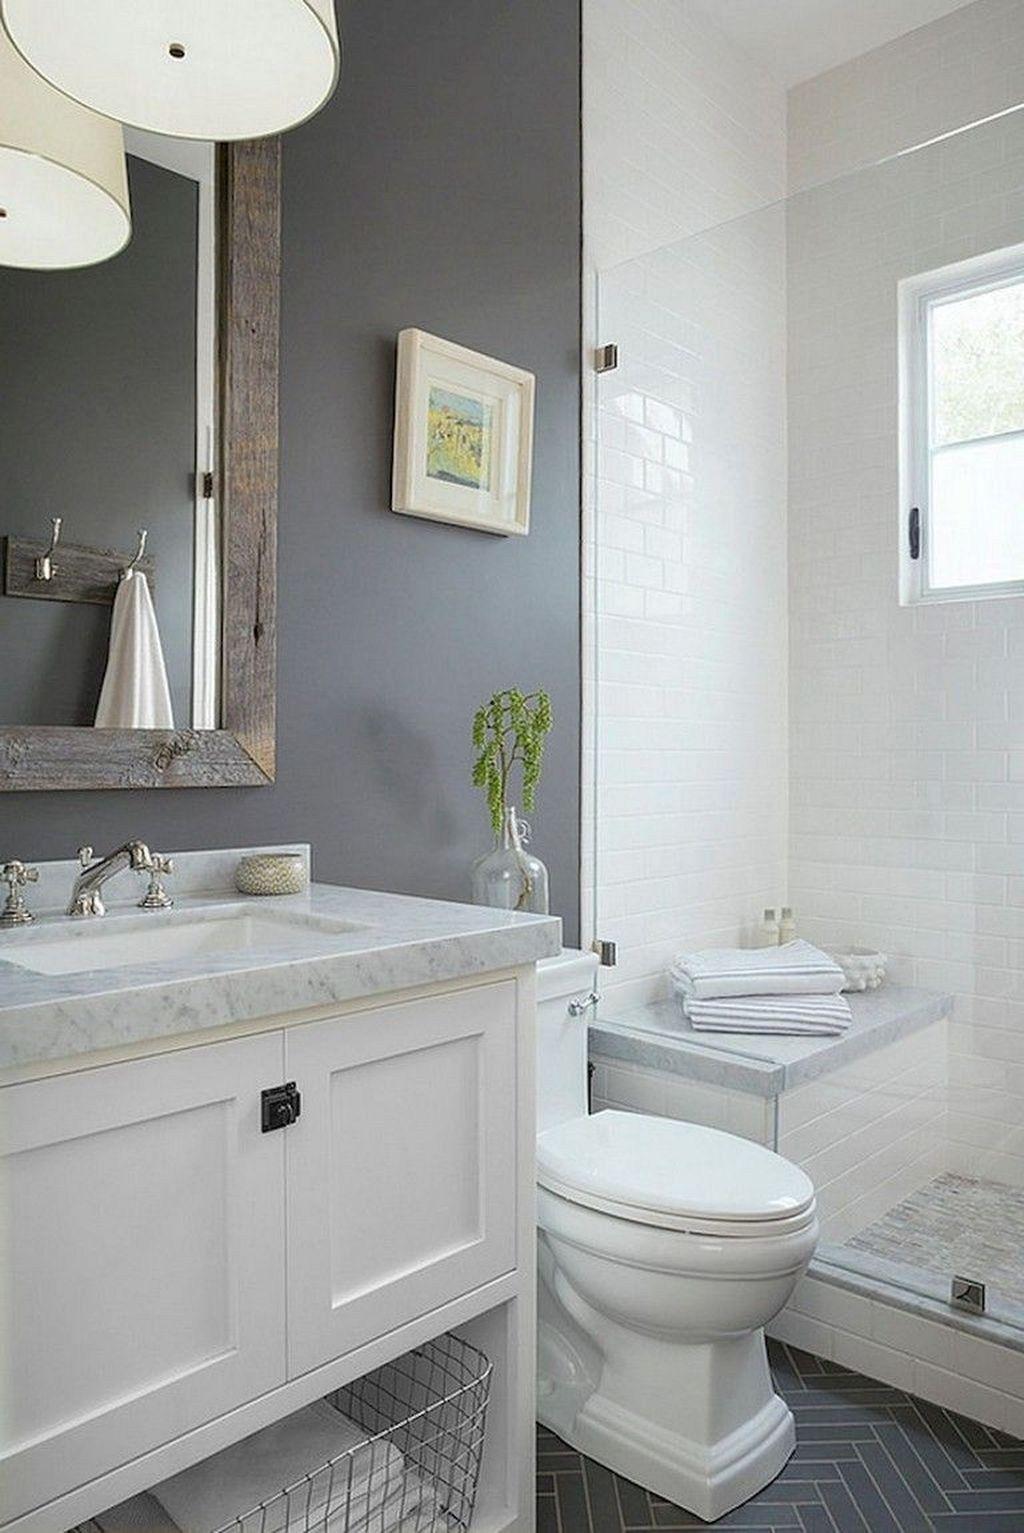 20 cheap bathroom remodel design ideas small master on bathroom renovation ideas modern id=90142